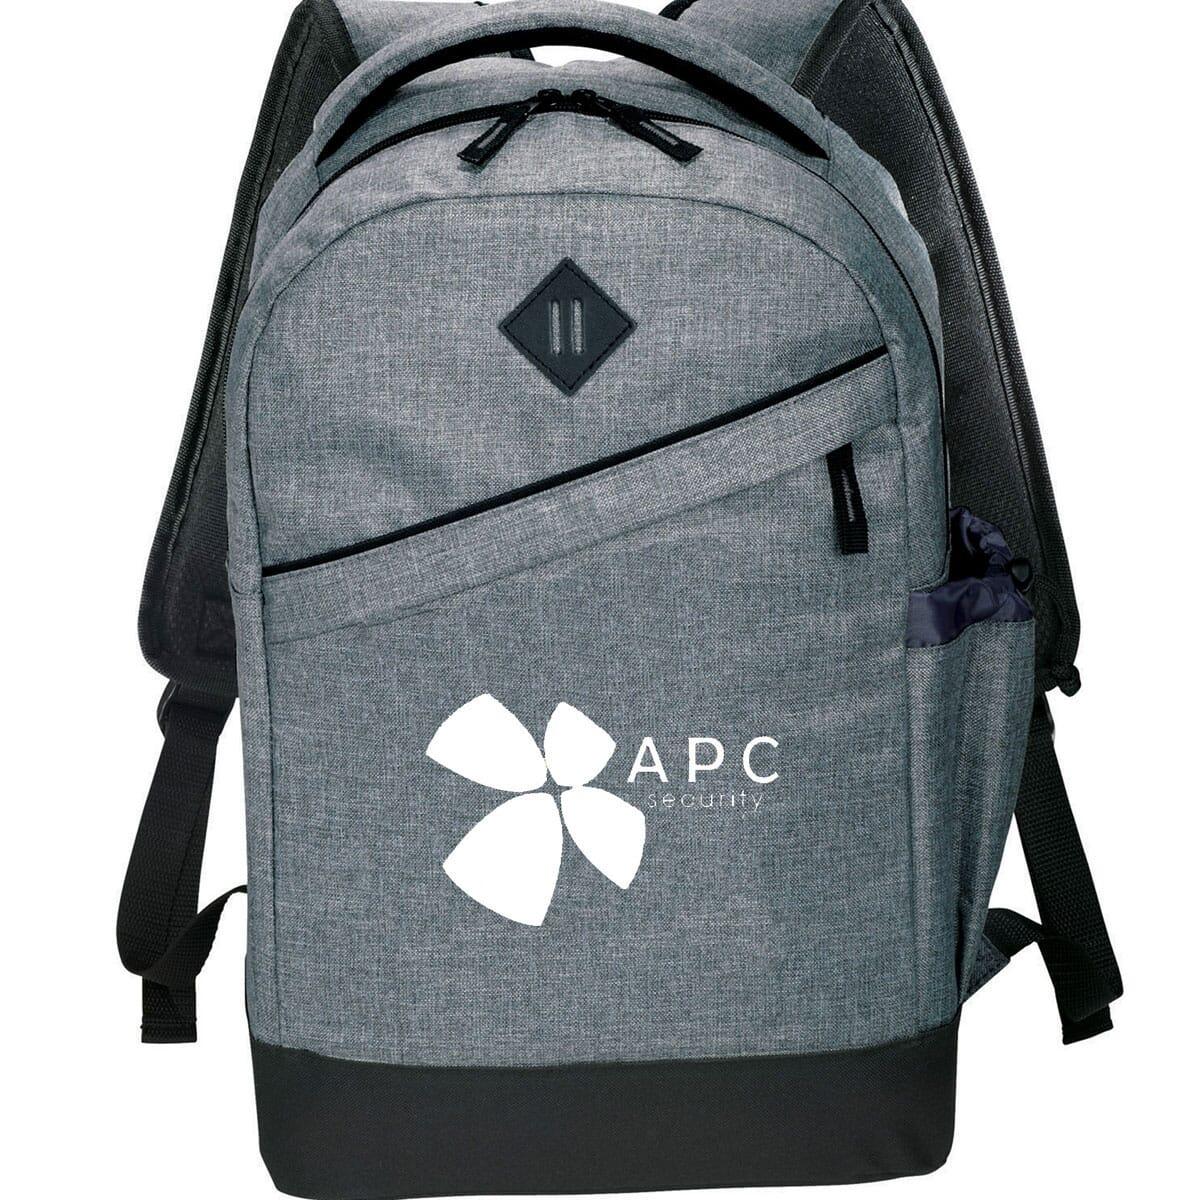 Stylish computer backpack